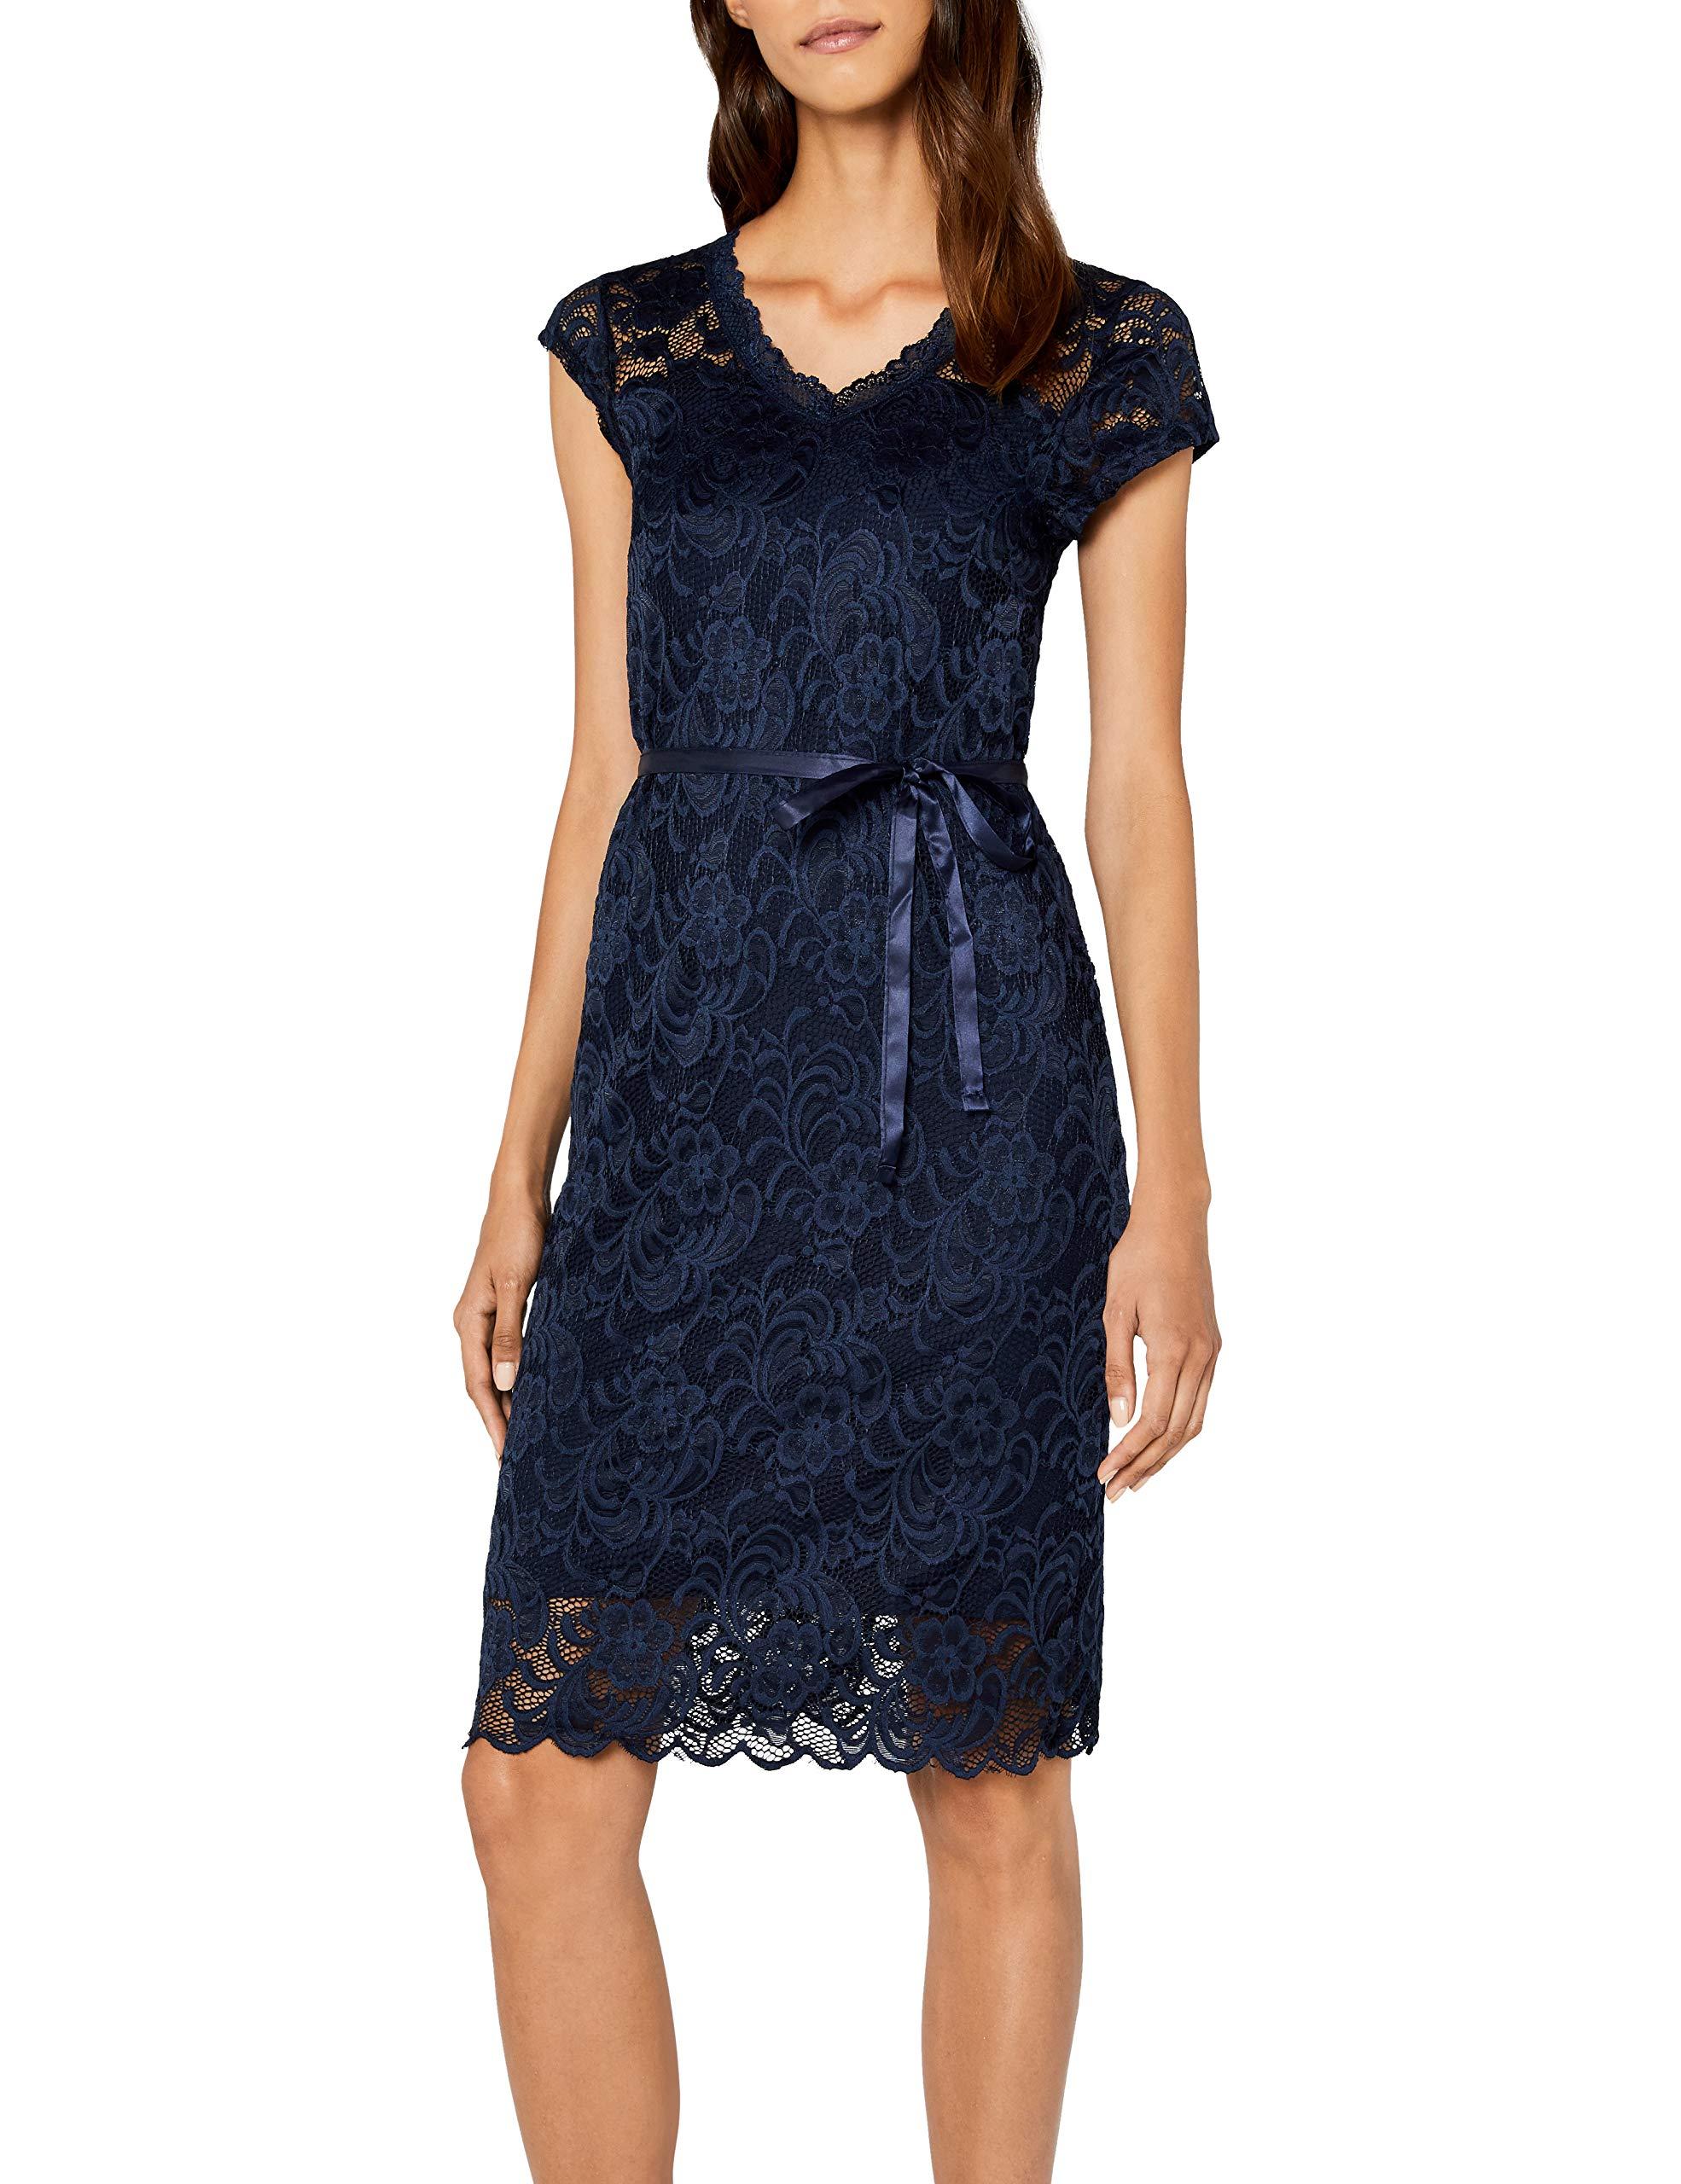 Mamalicious Cap Jersey Mlnewmivana Blazer36taille Dress RobeBleunavy FabricantX smallFemme lFJKc1